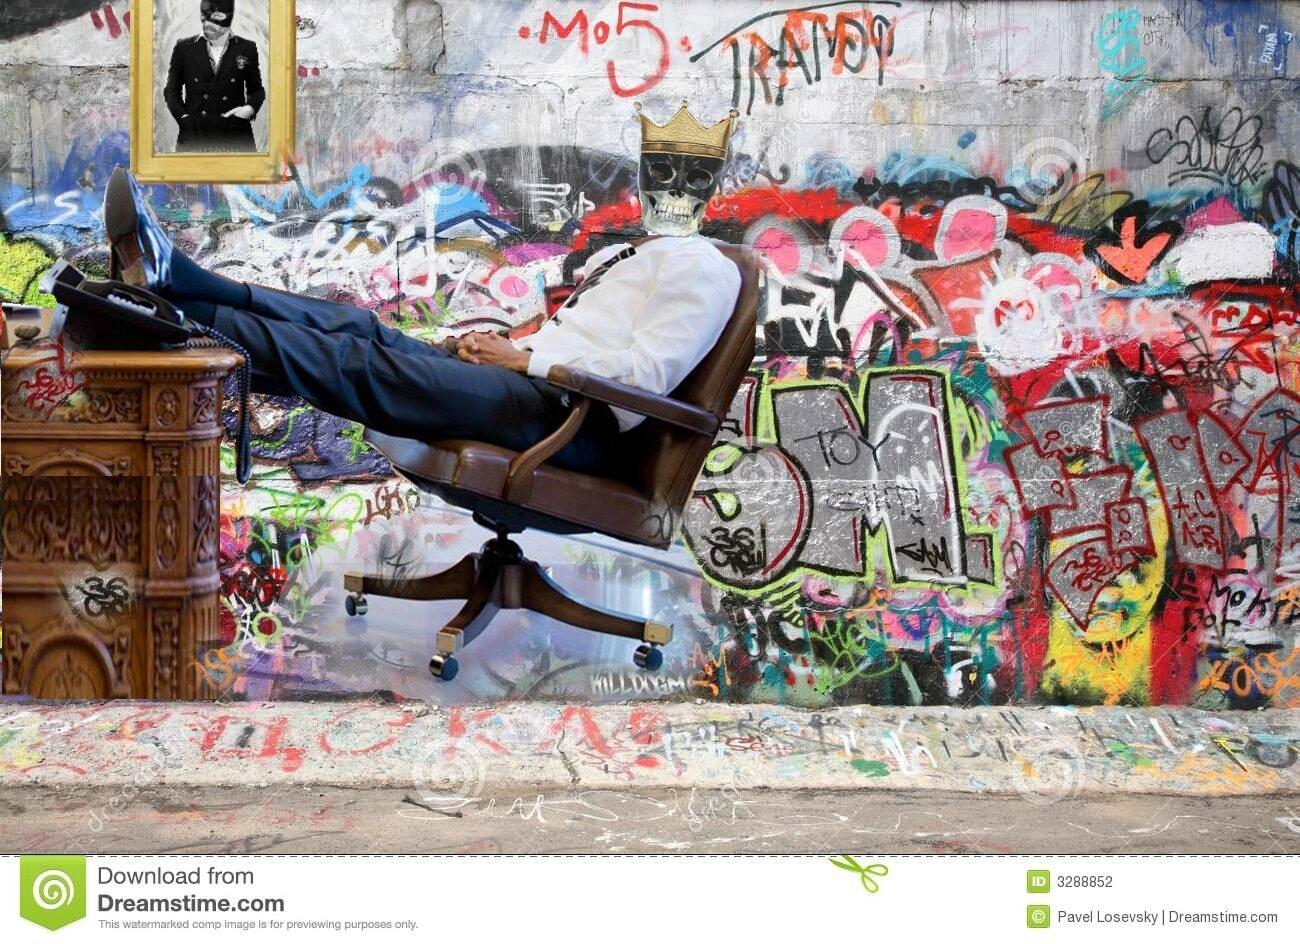 graffiti-de-ville-3288852